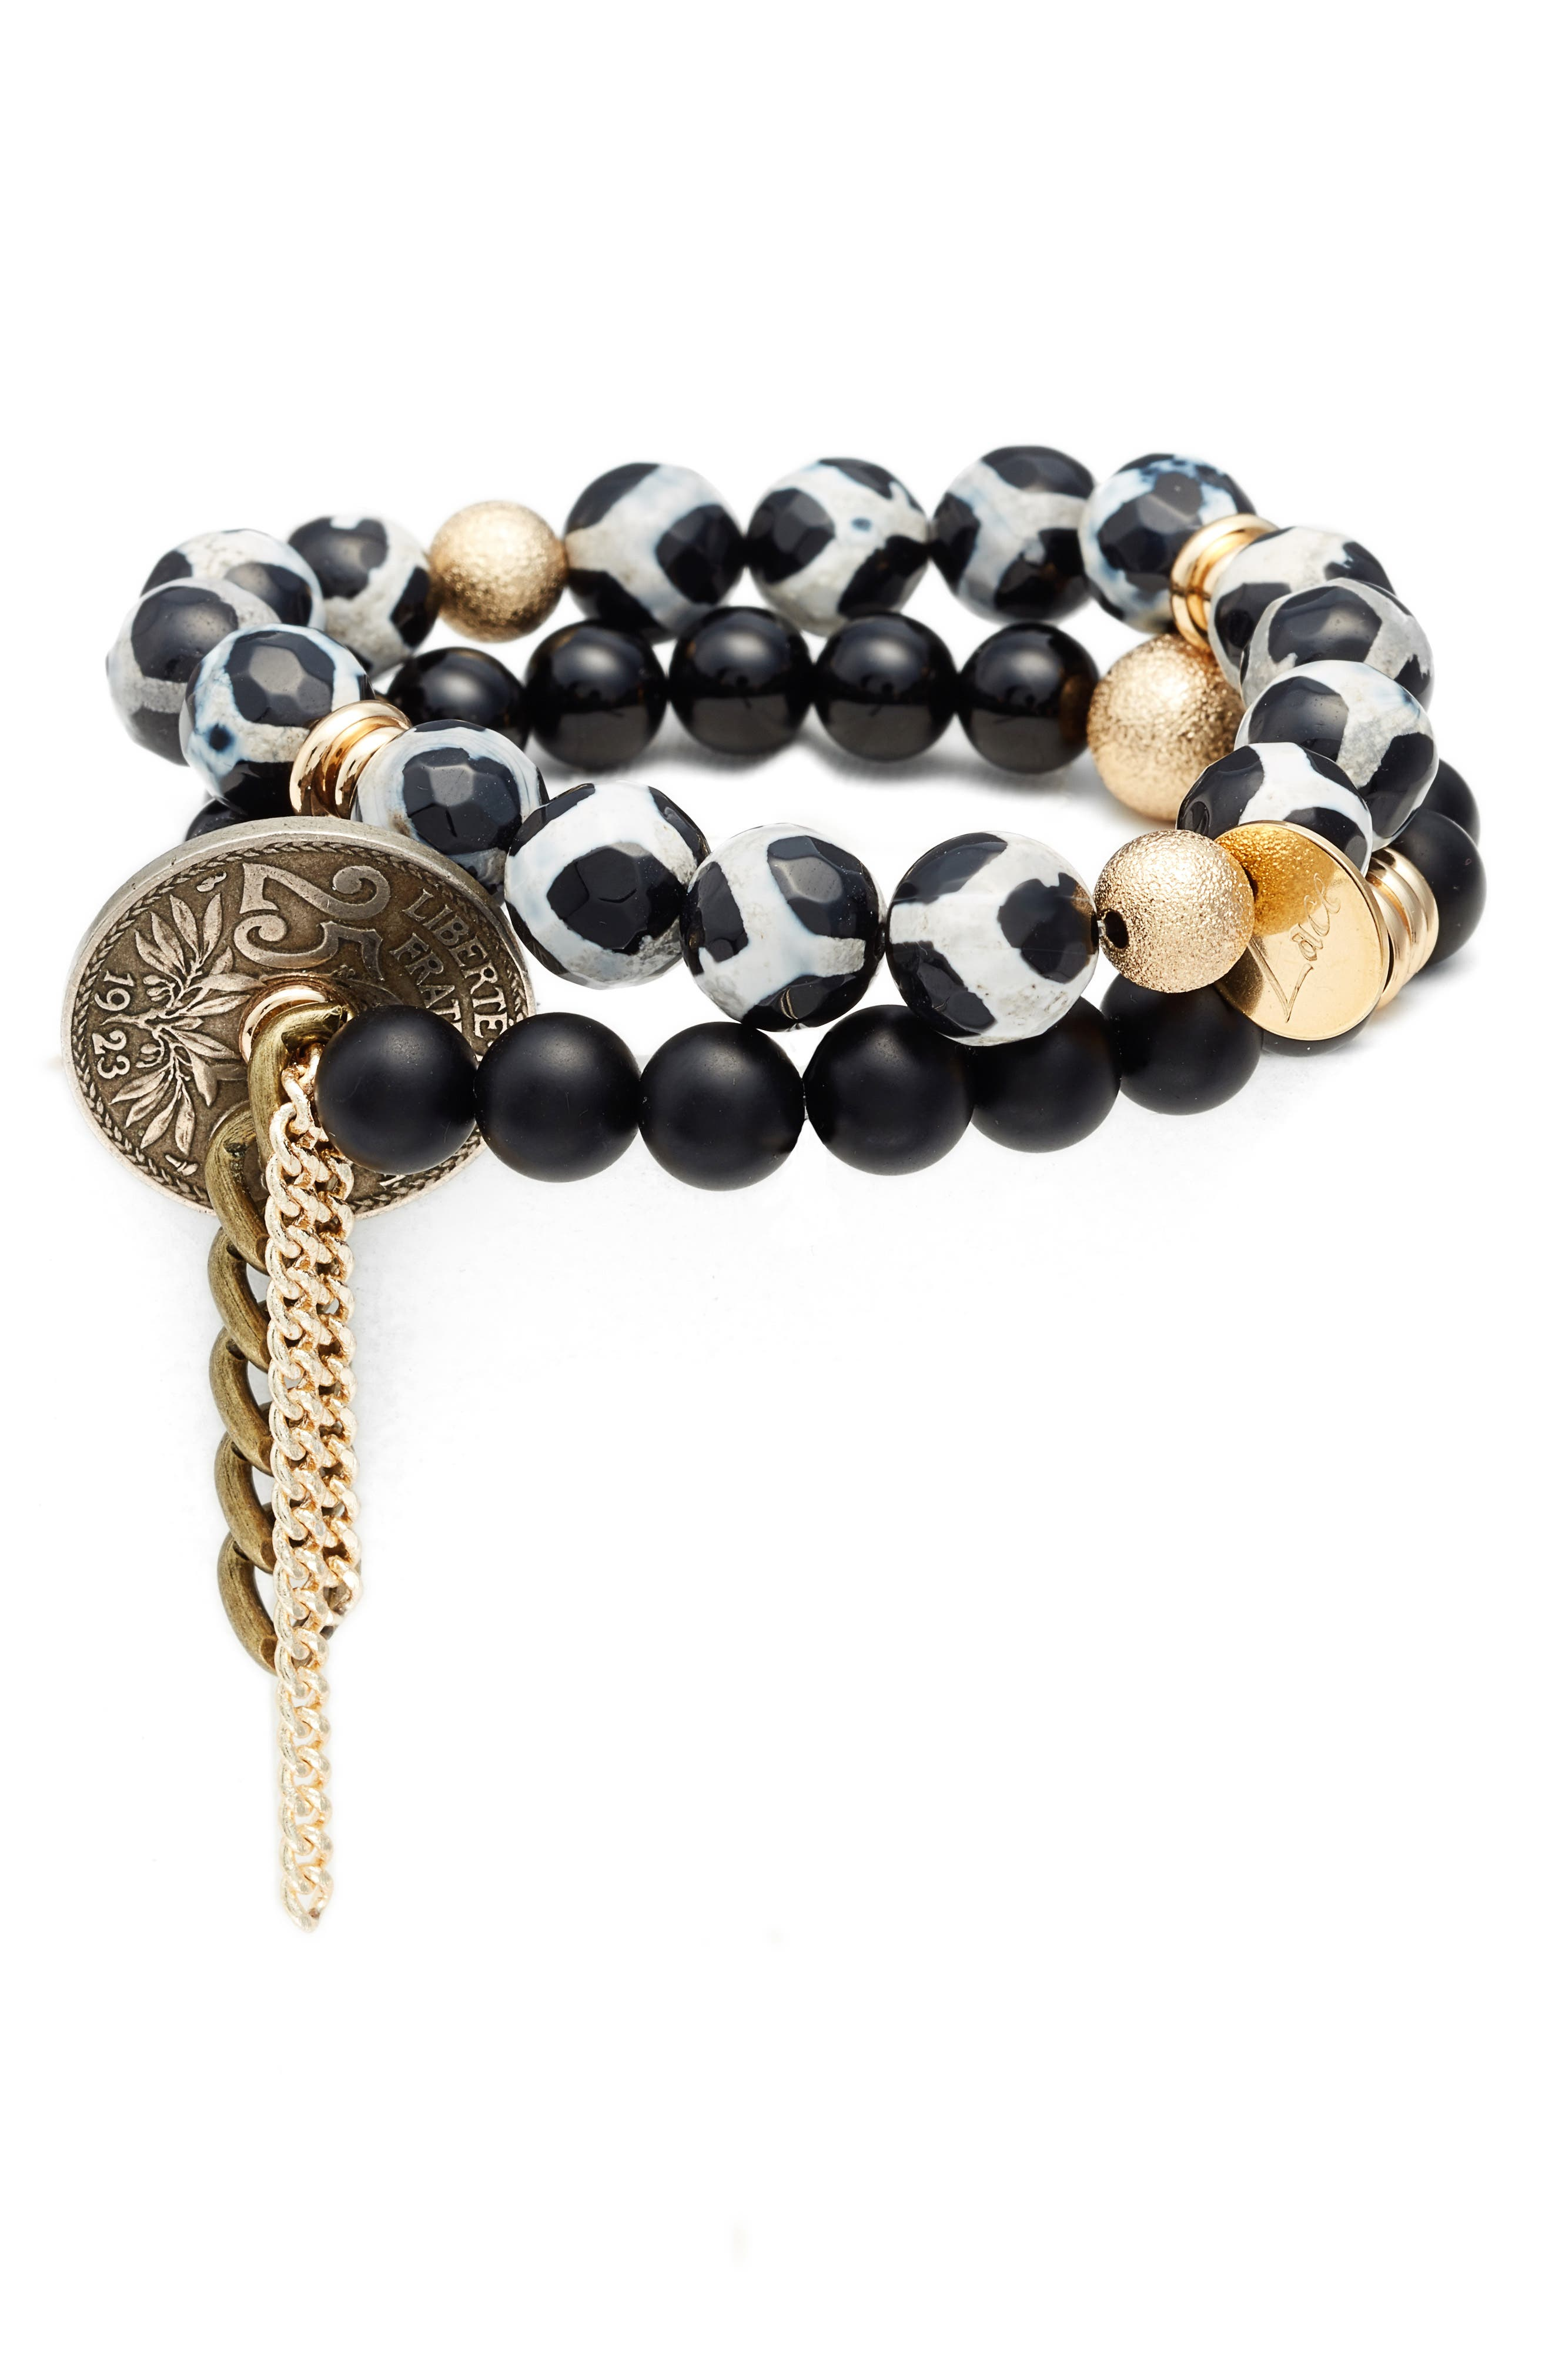 The Lace Project Set of 2 Bead Stretch Bracelets